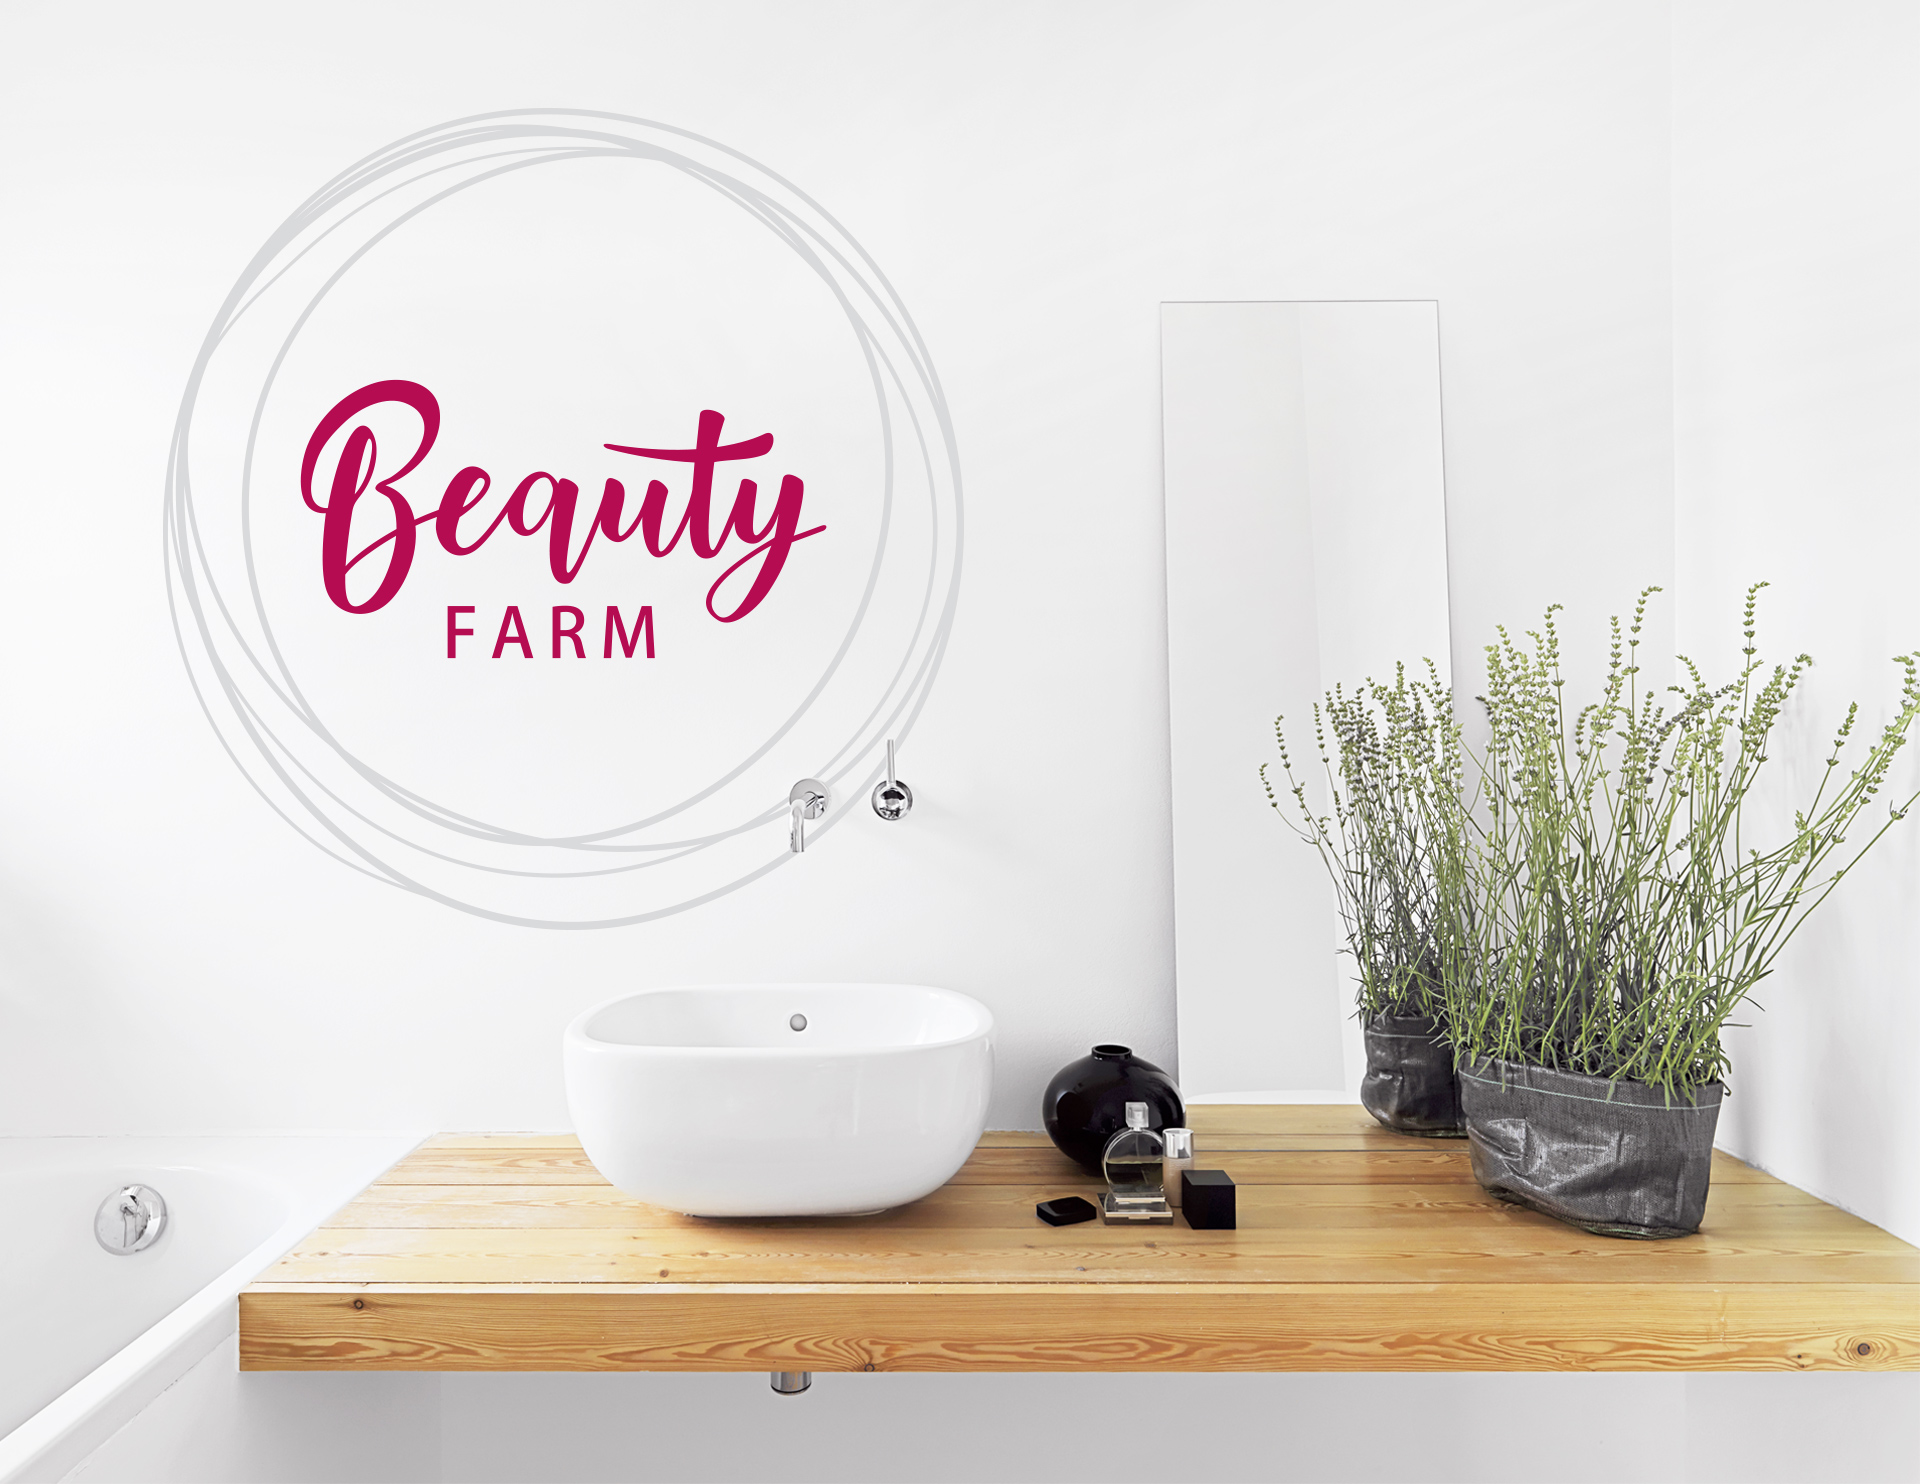 wandtattoo beauty farm f r die make up ecke in bad co. Black Bedroom Furniture Sets. Home Design Ideas